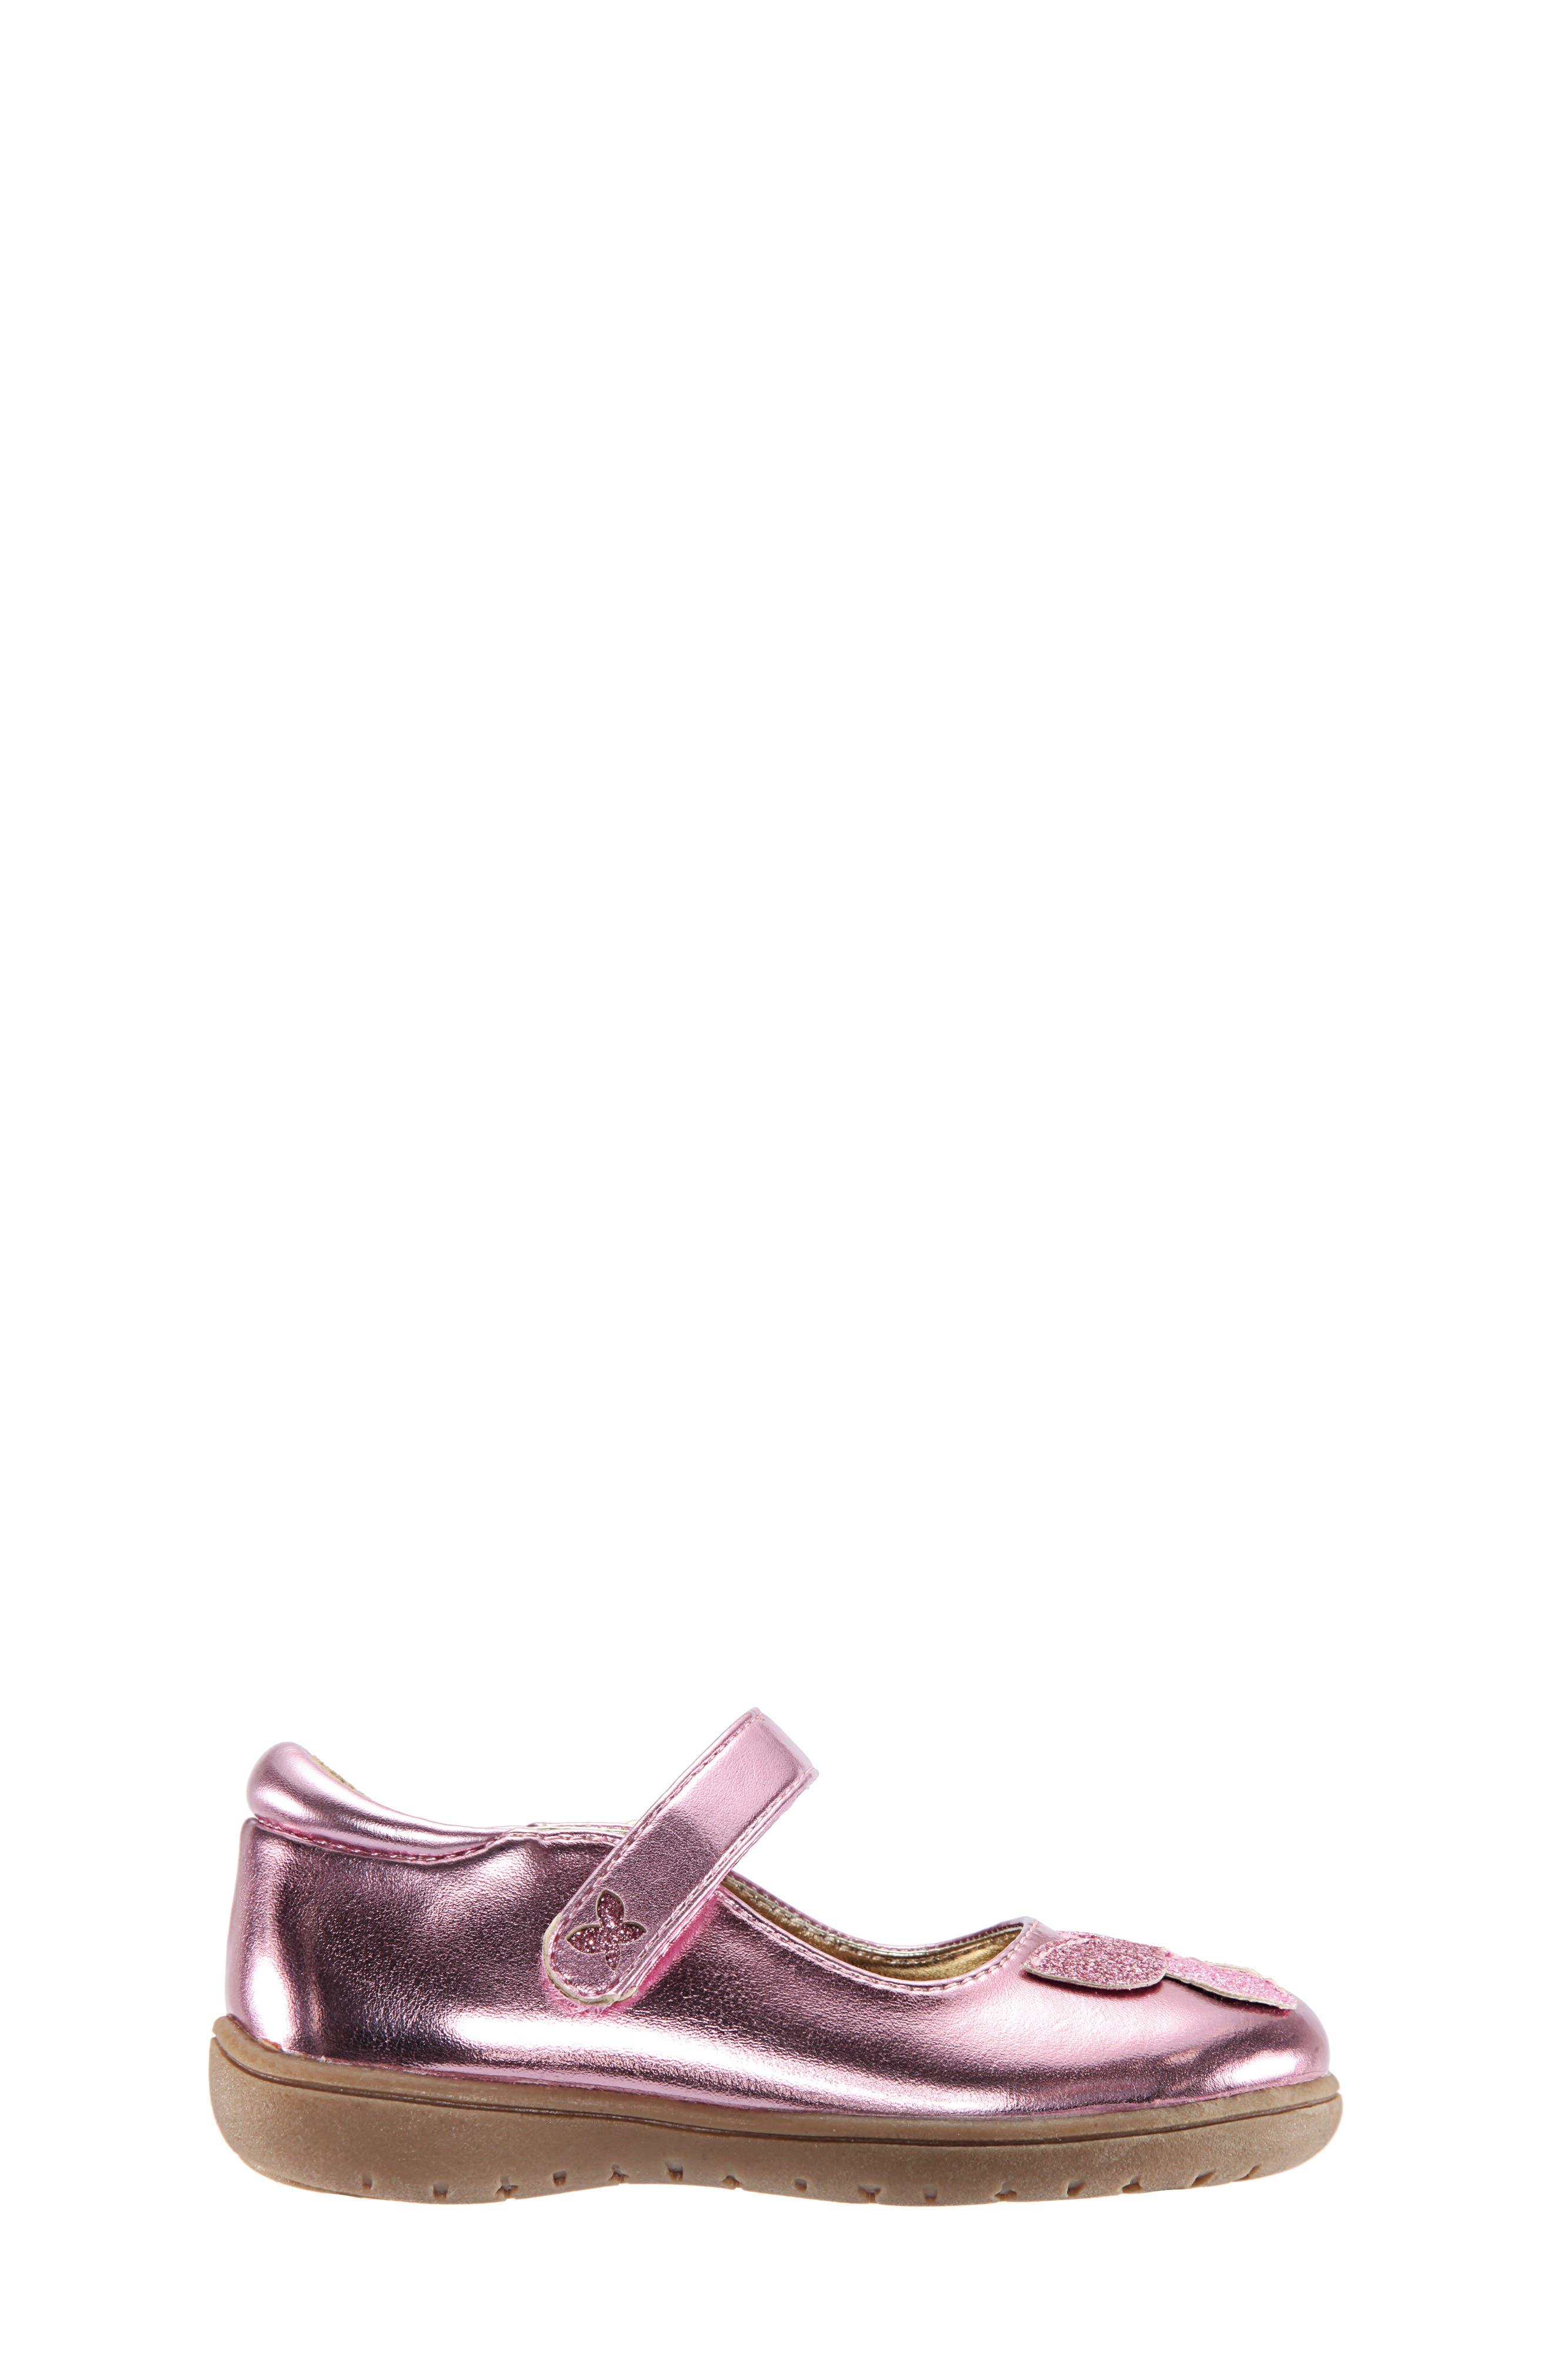 Alysha Glitter Mary Jane,                             Alternate thumbnail 3, color,                             PINK/ SMOOTH GLITTER